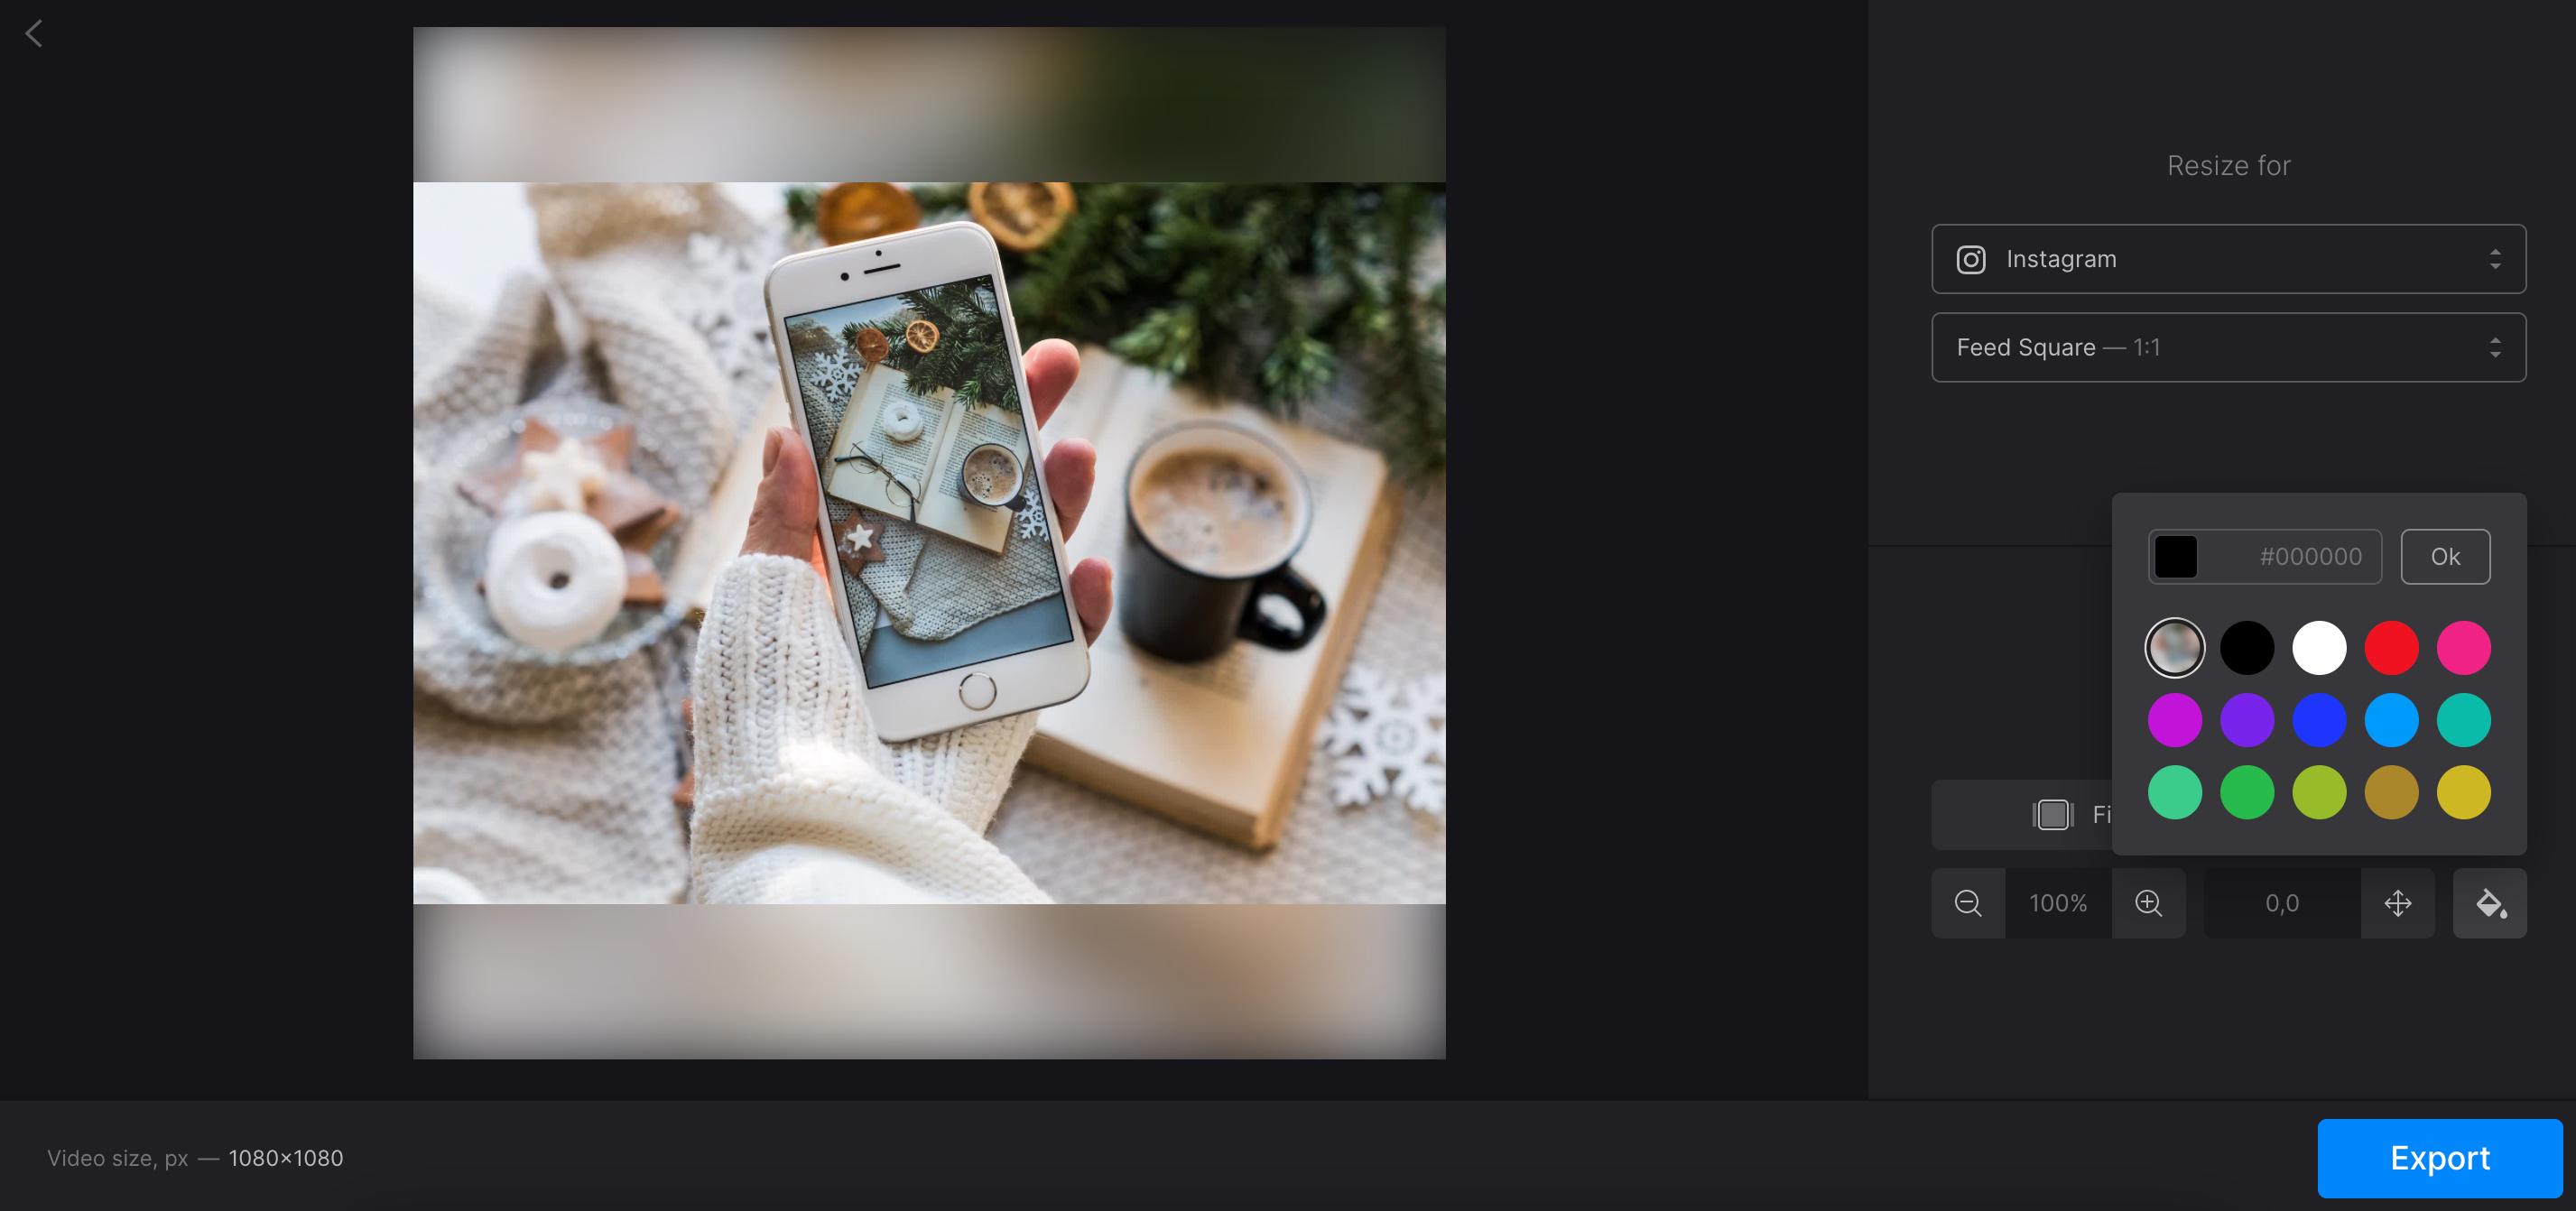 Change file's aspect ratio for social media